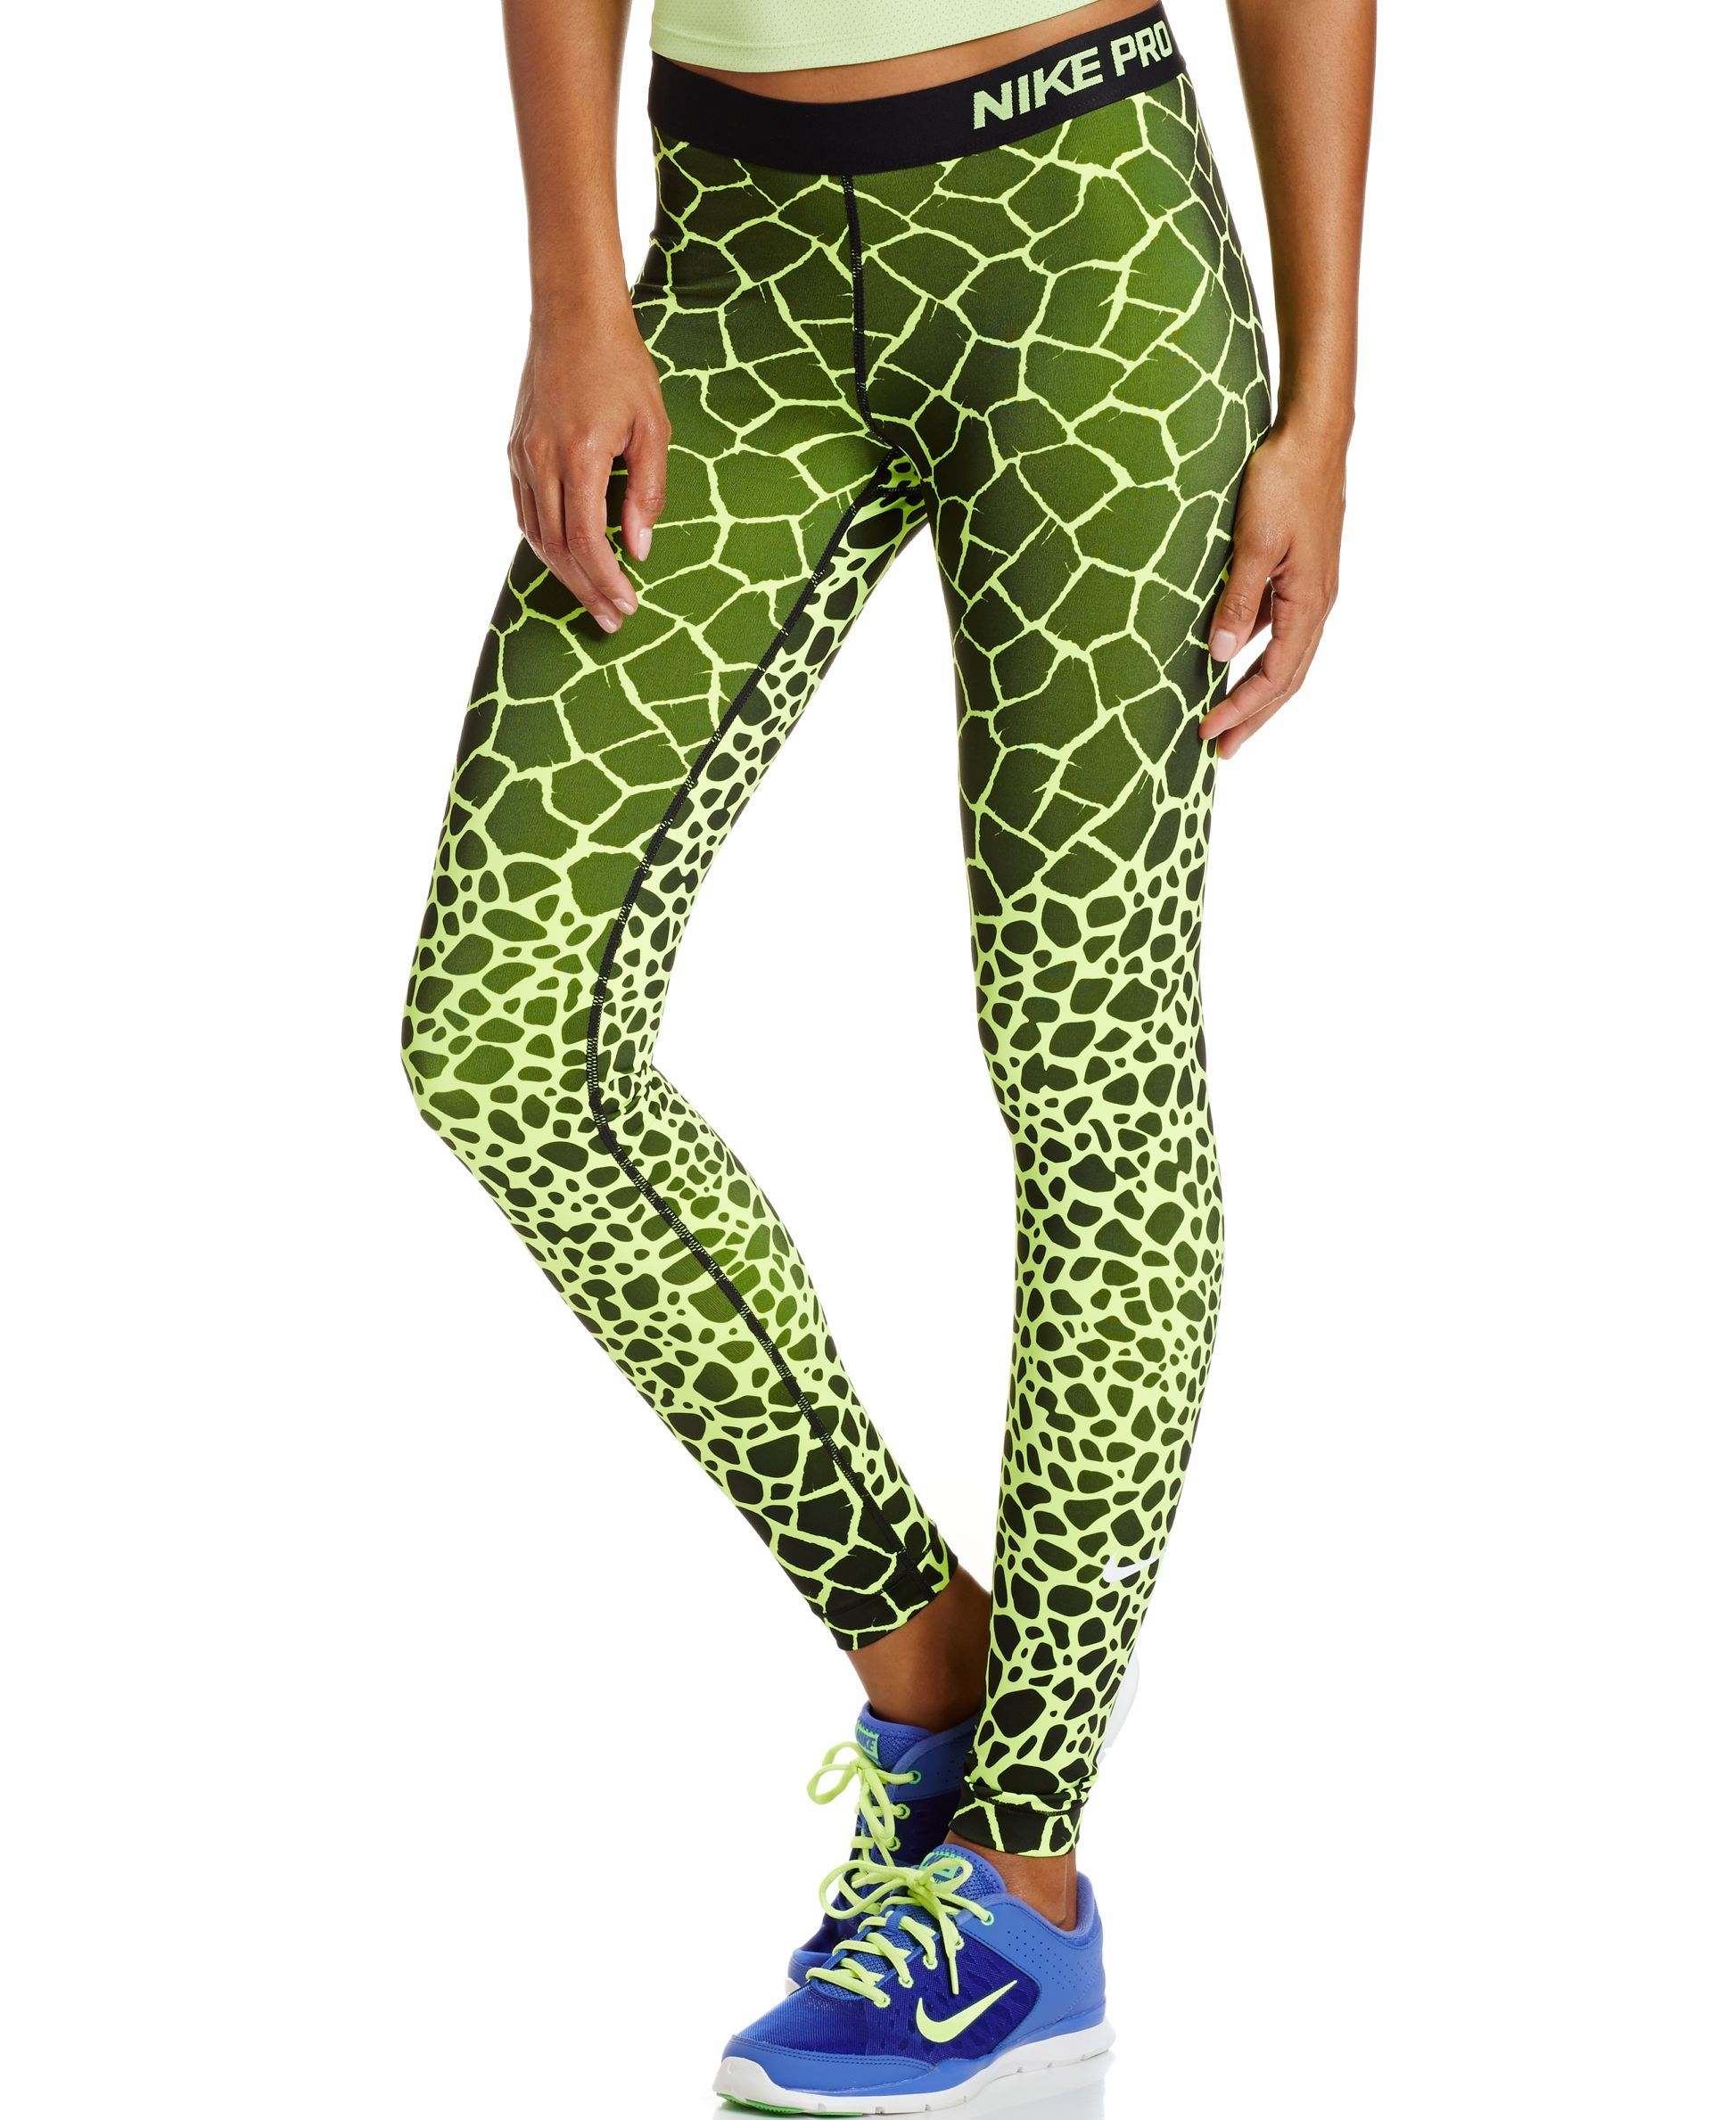 Nike Pro Engineered Dri FIT Giraffe Print Leggings Pants